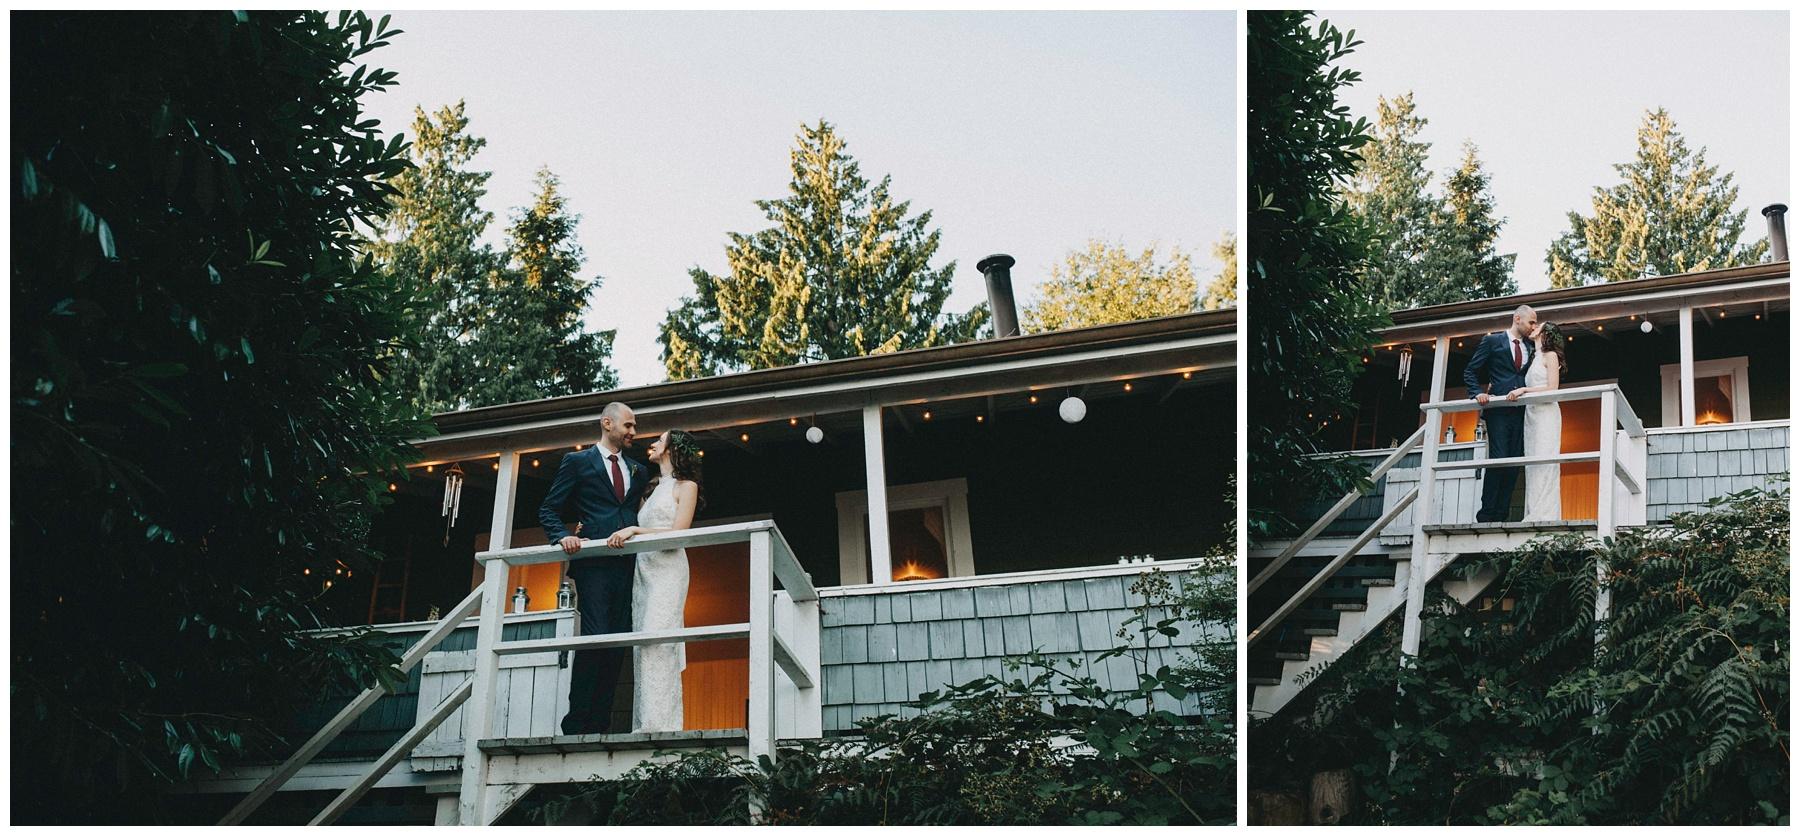 Vancouver intimate Wedding Photographer_0557.jpg